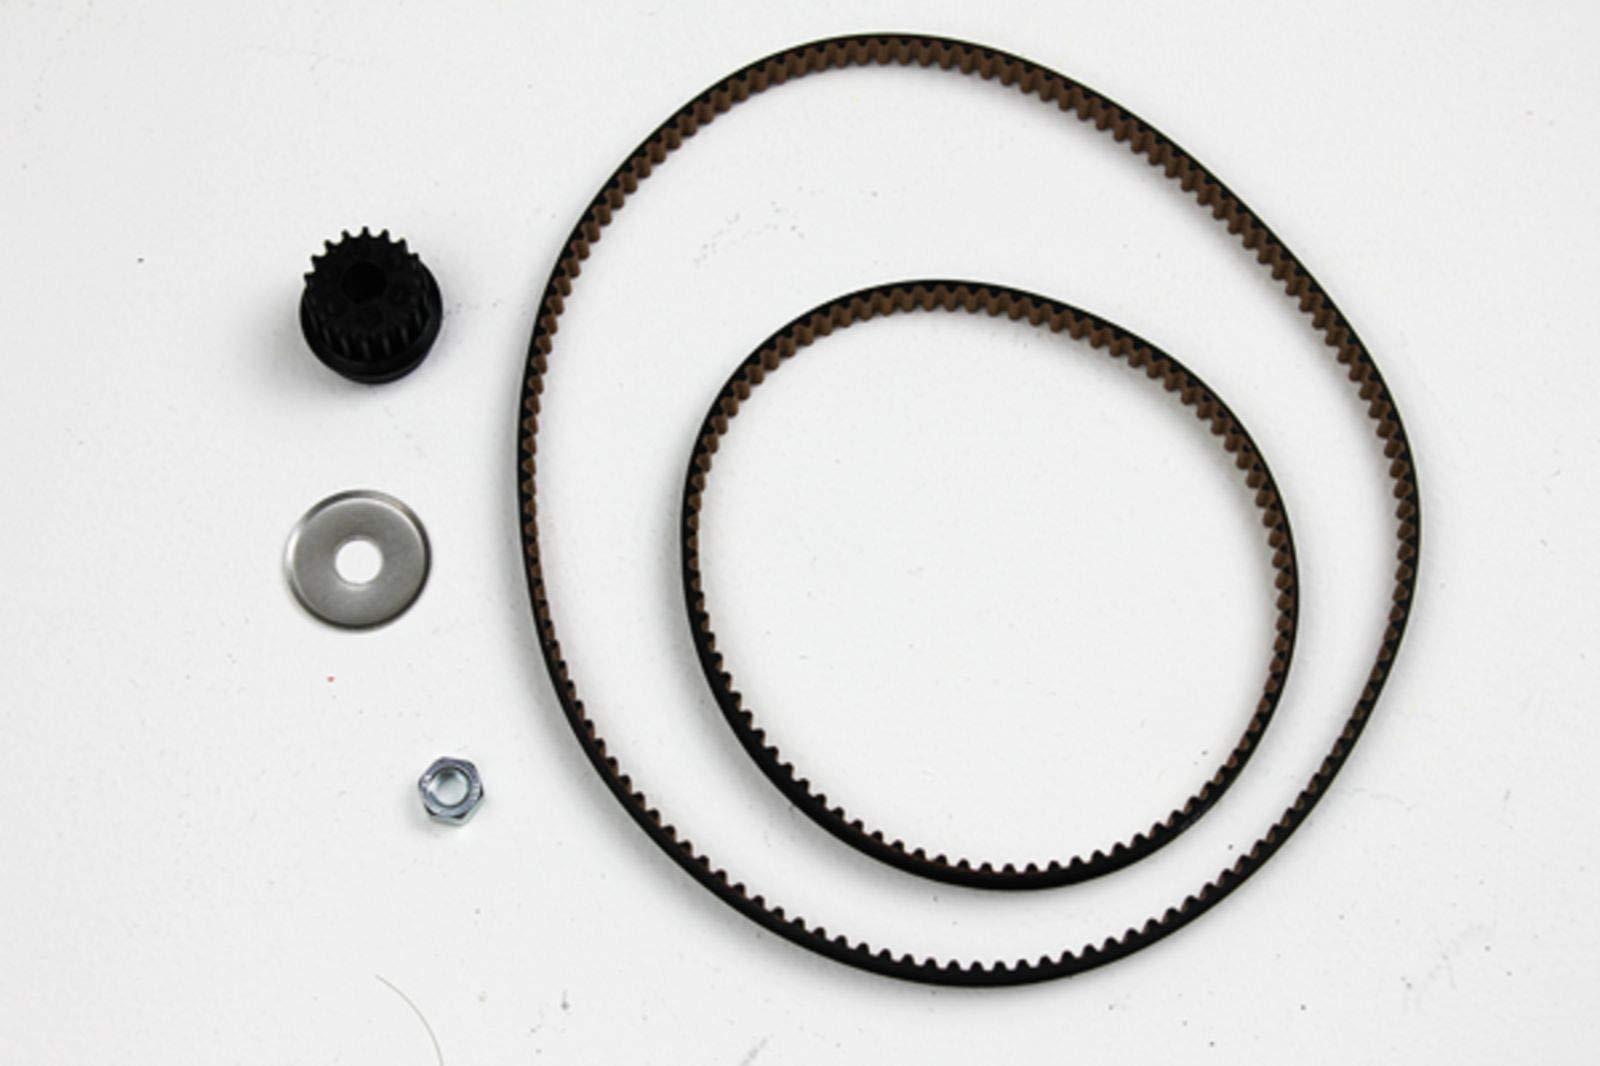 Advance Clarke Model GU12DMU Commercial Carpet Master Belt - 1470905500